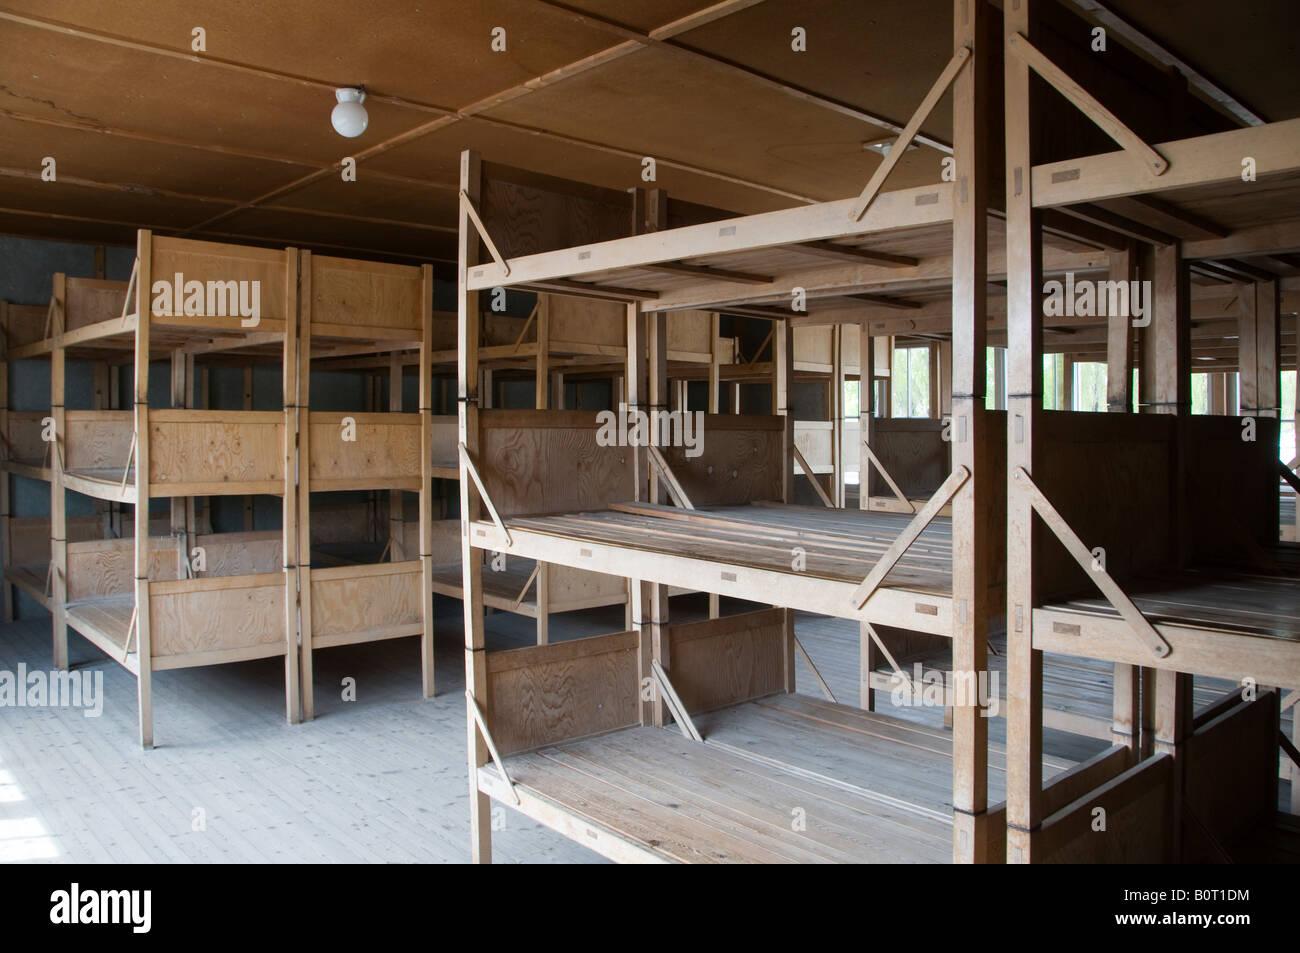 Picture of: Wooden Triple Bunks Inside Prisoners Barracks In Dachau Stock Photo Alamy